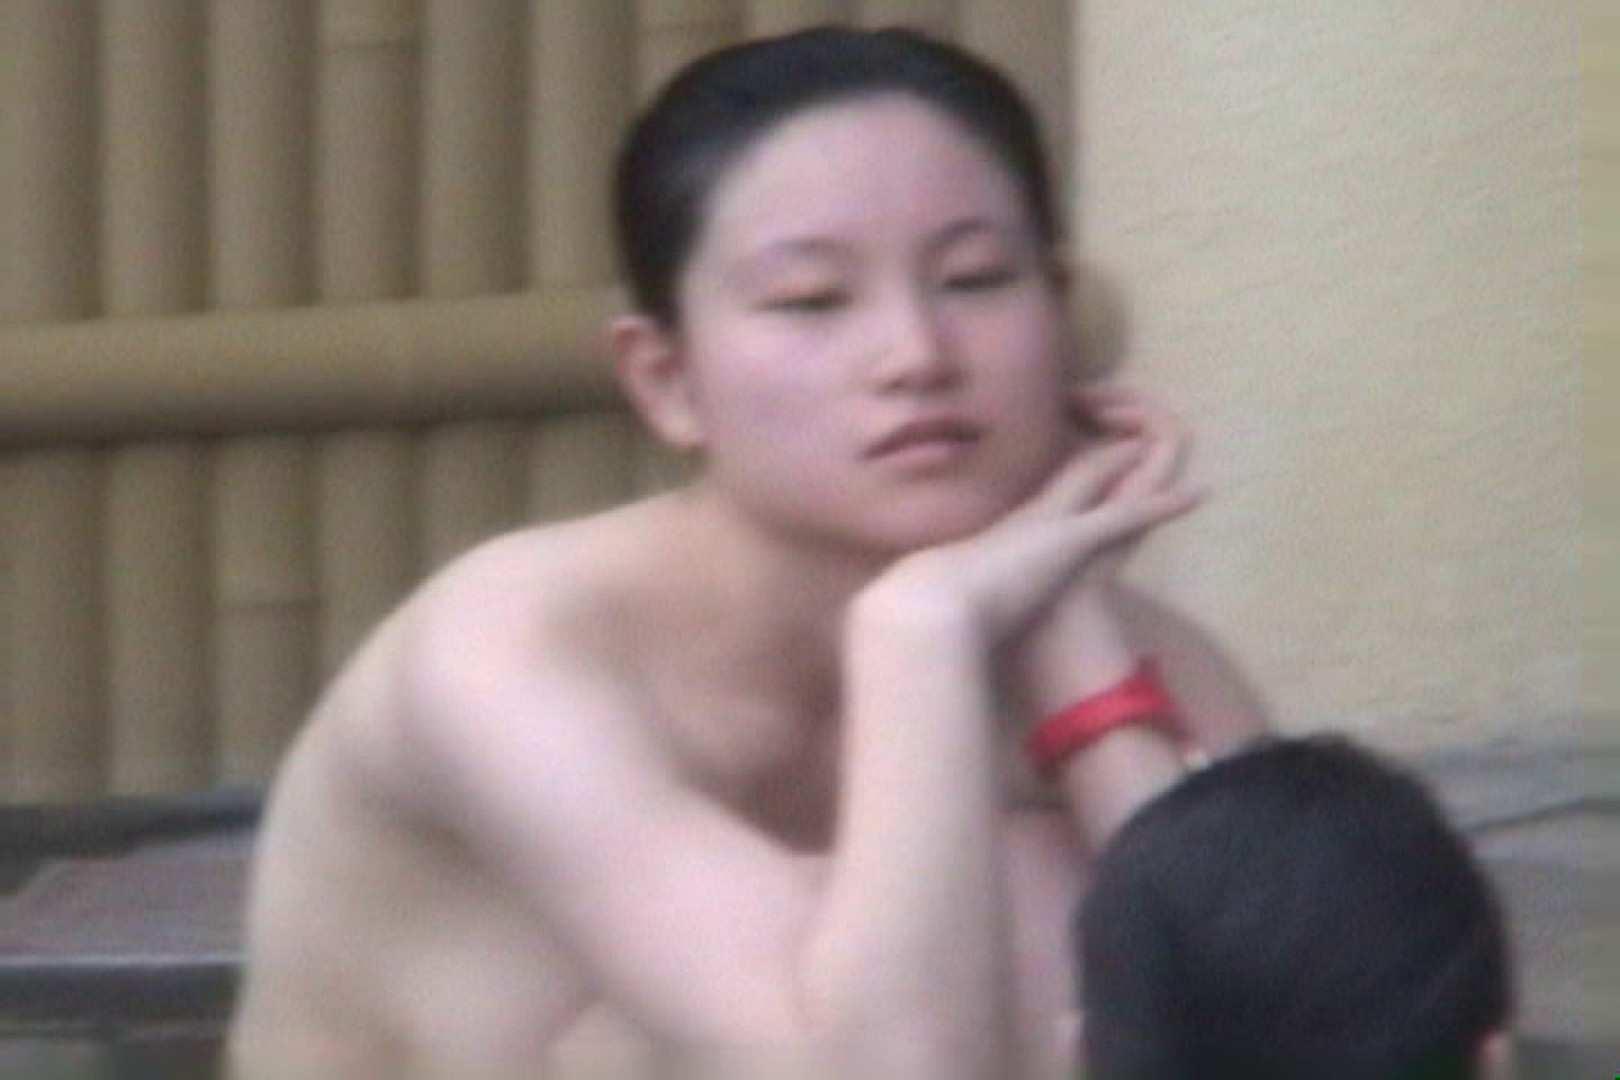 Aquaな露天風呂Vol.45【VIP限定】 HなOL   盗撮  100pic 33